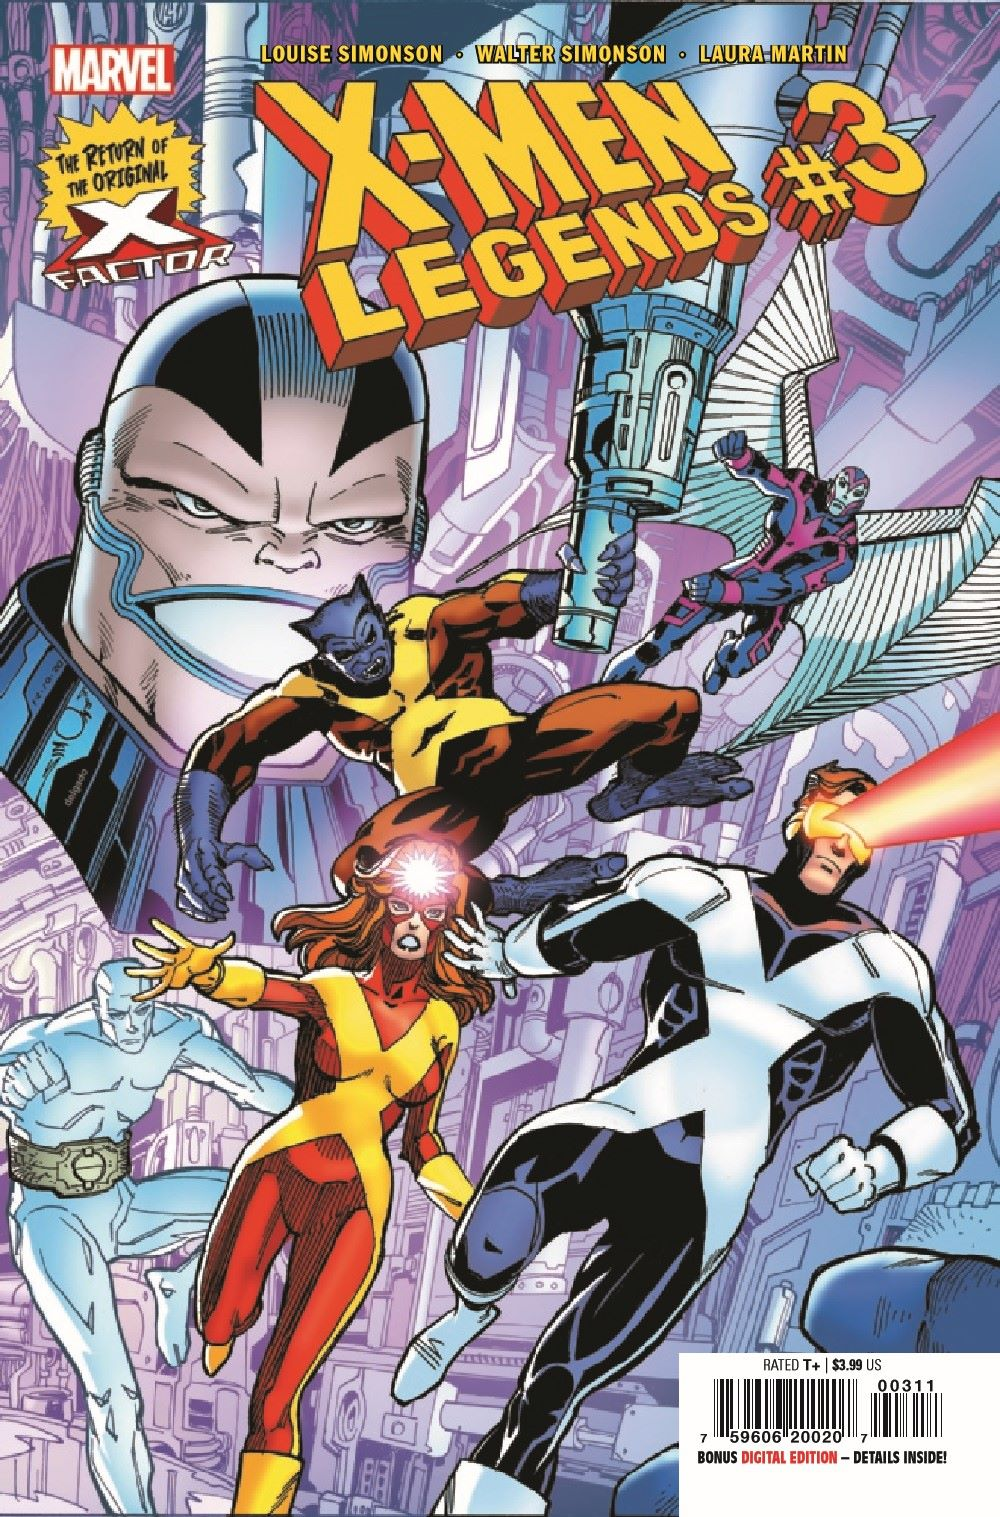 XMLEGENDS2021003_Preview-1 ComicList Previews: X-MEN LEGENDS #3